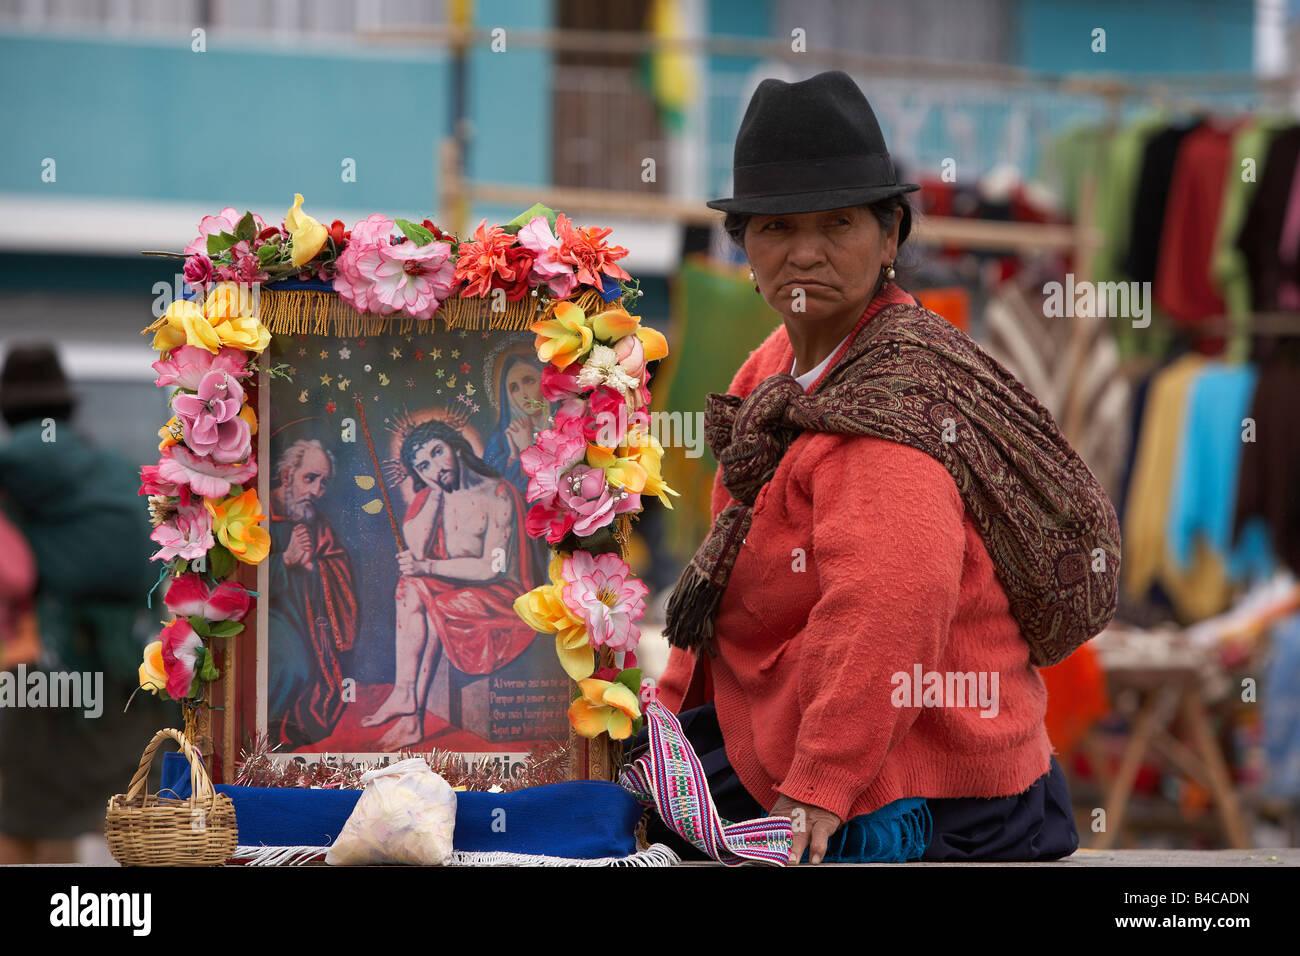 Woman with religious picture, Saquisili Market, Andes Mountains, Ecuador - Stock Image